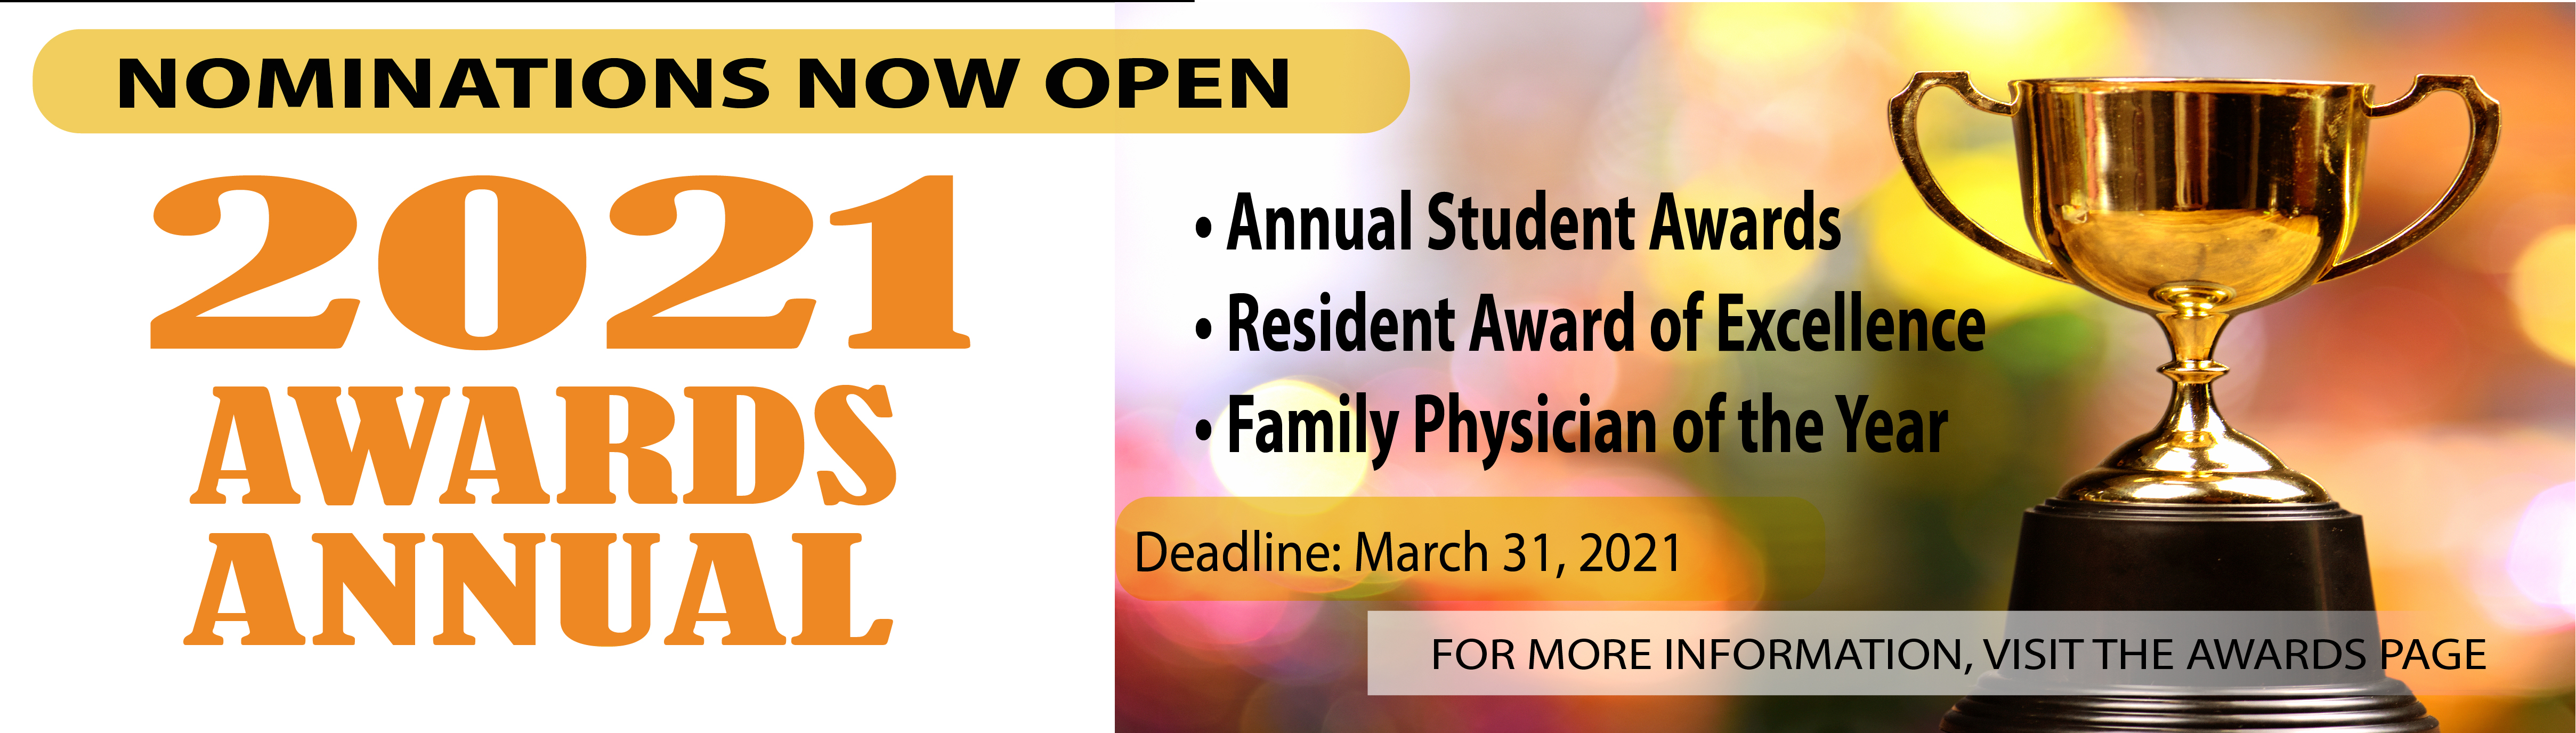 2021-Awards-web-banner